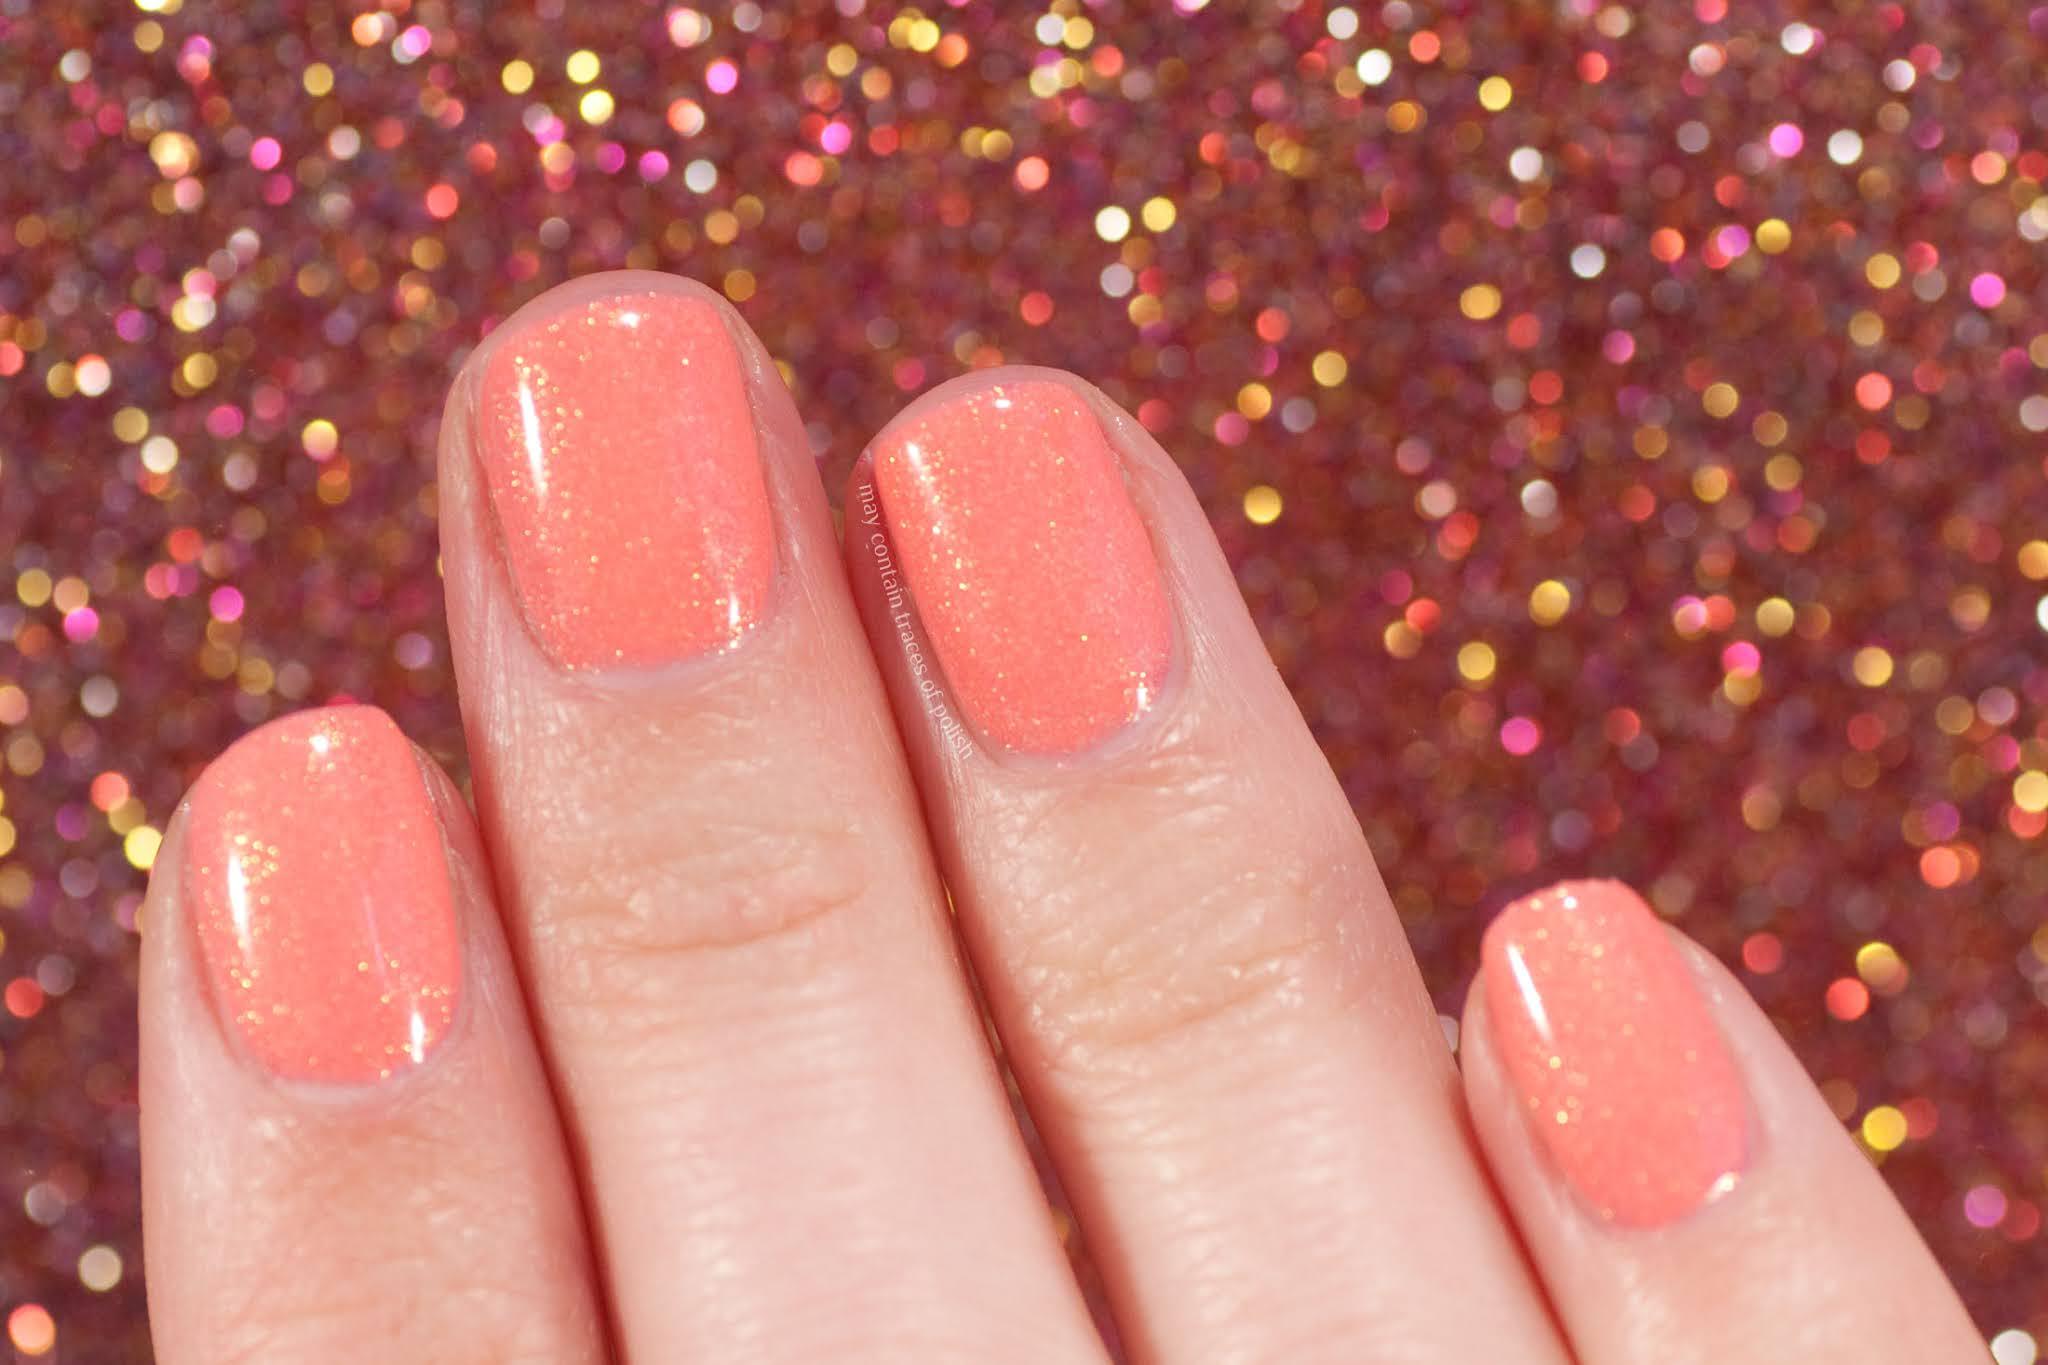 Pink Gellac swatches - 159 Glamorous Peach